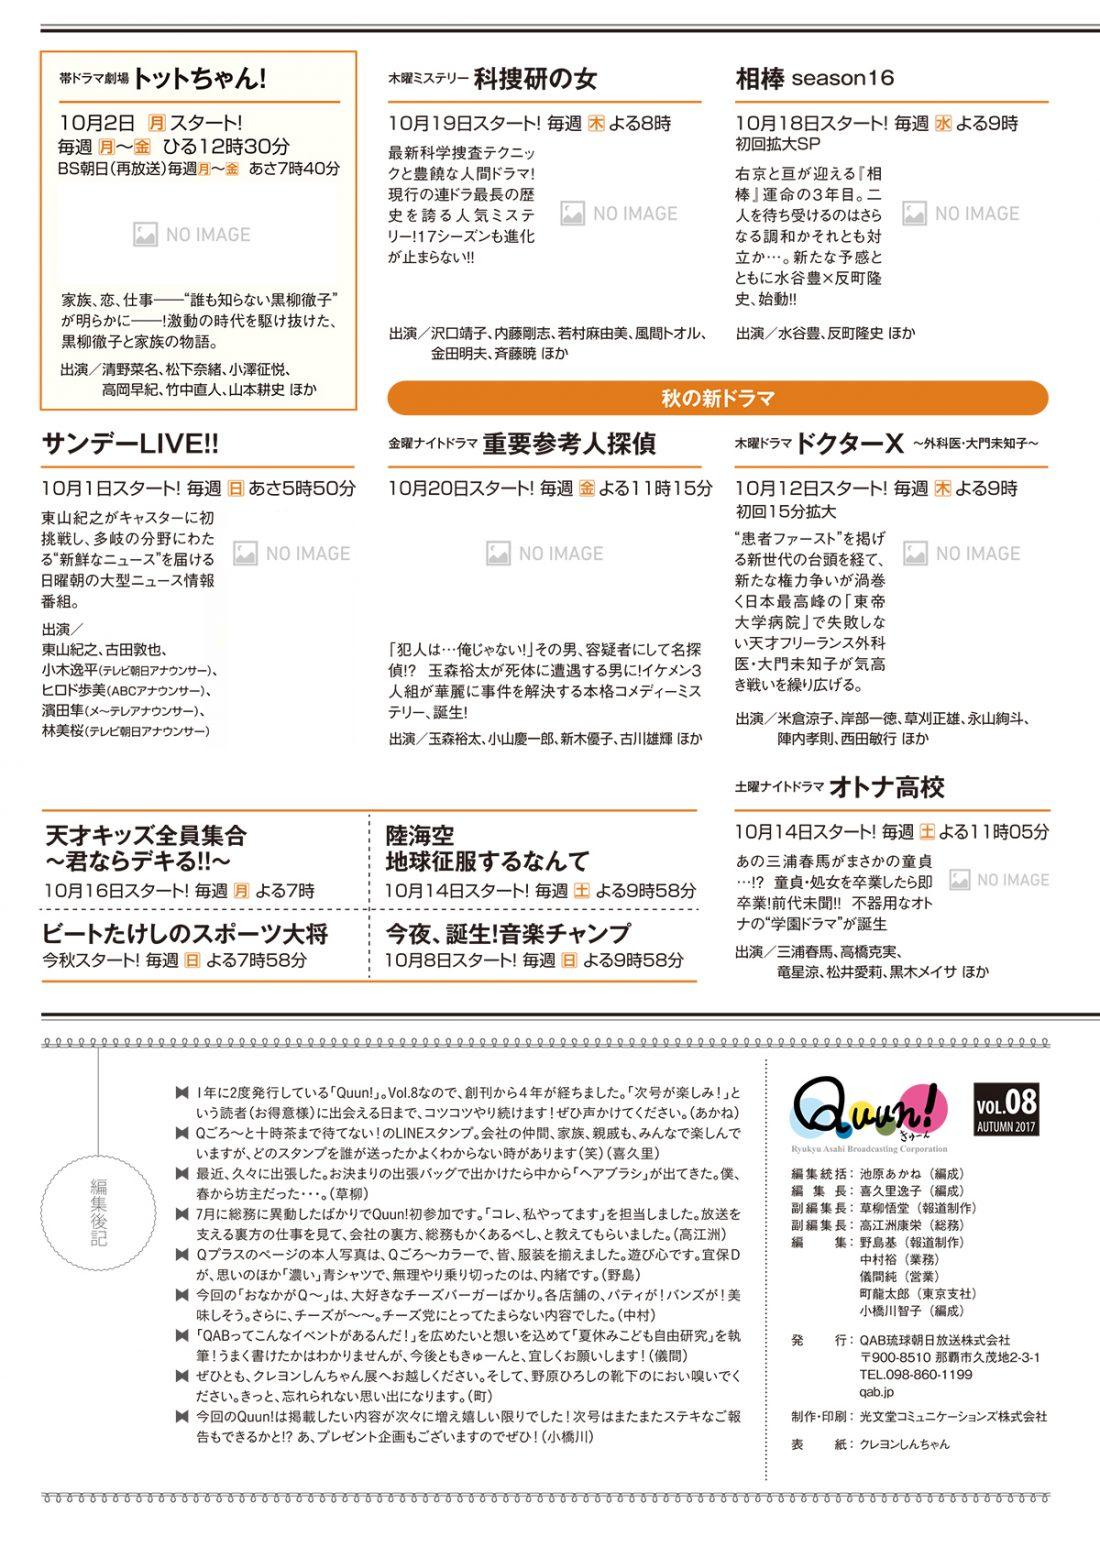 http://www.qab.co.jp/qgoro/wp-content/uploads/quun_0815-1100x1558.jpg